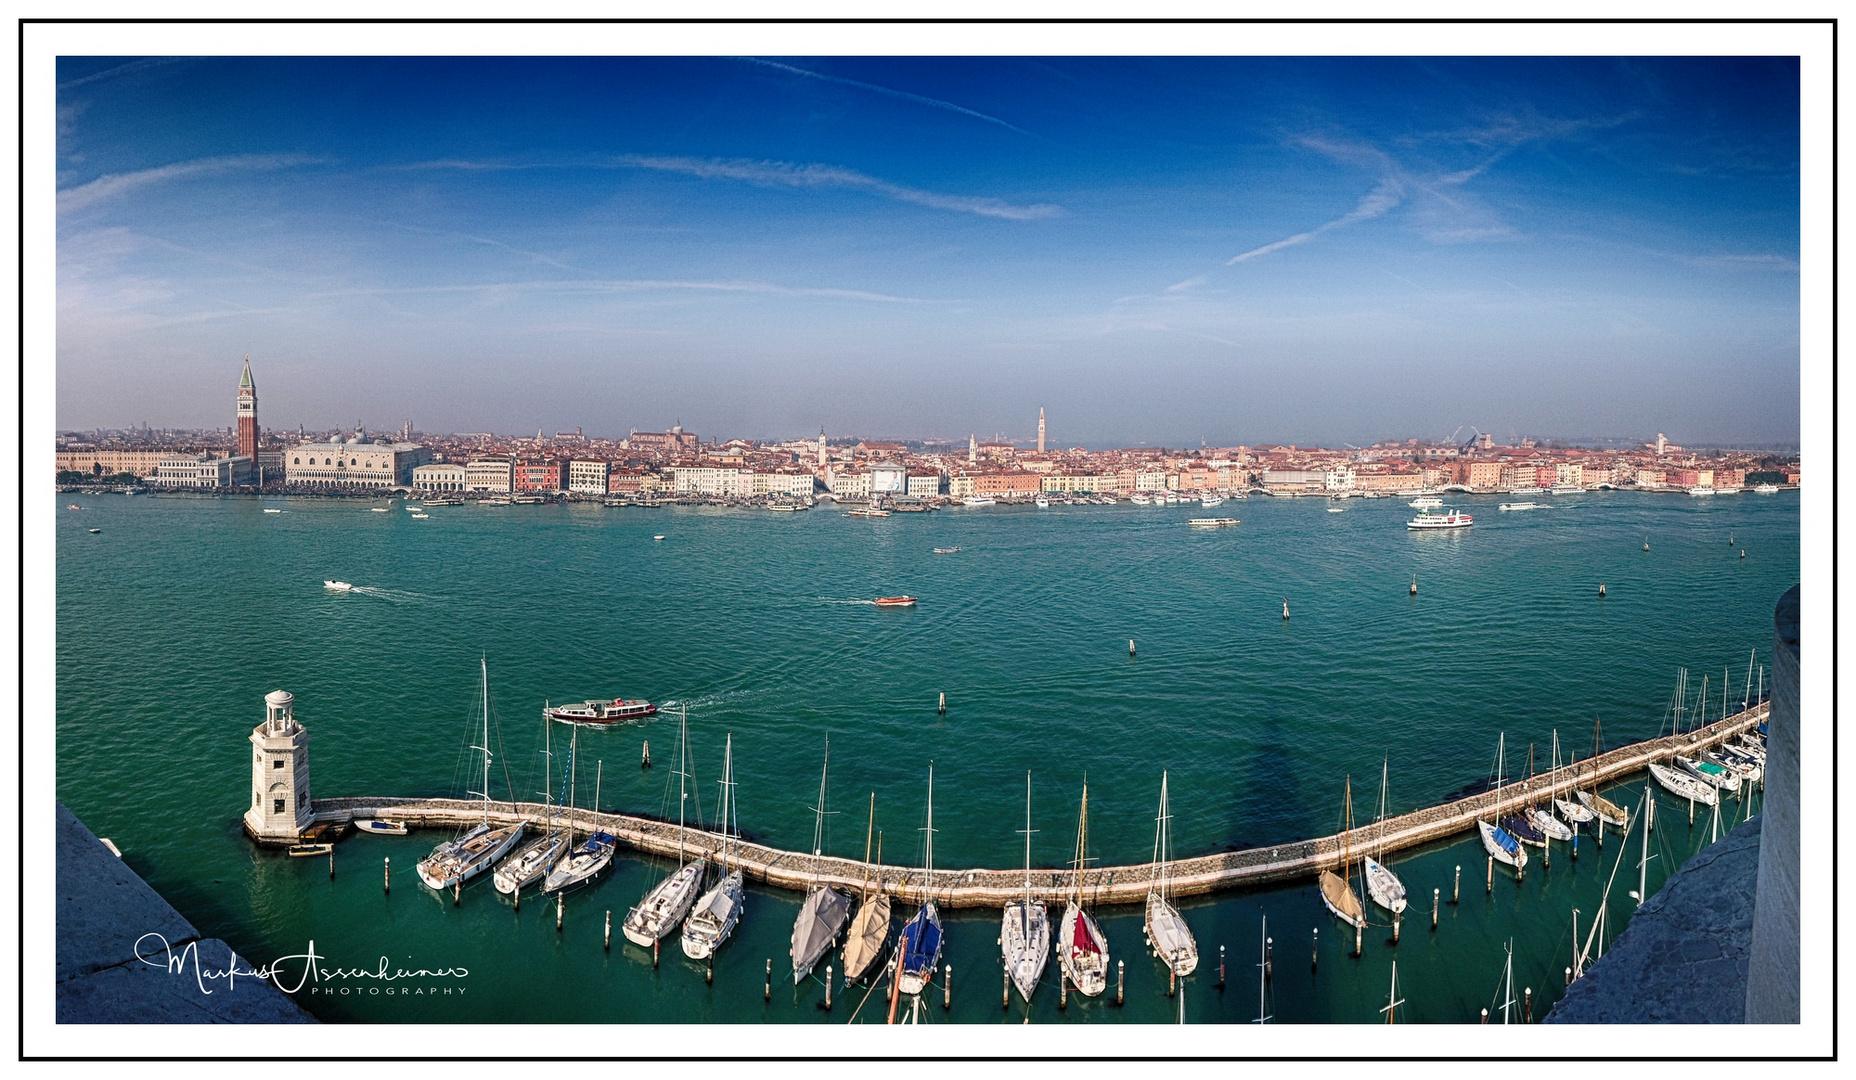 Venedig Jachthafen Giudecca